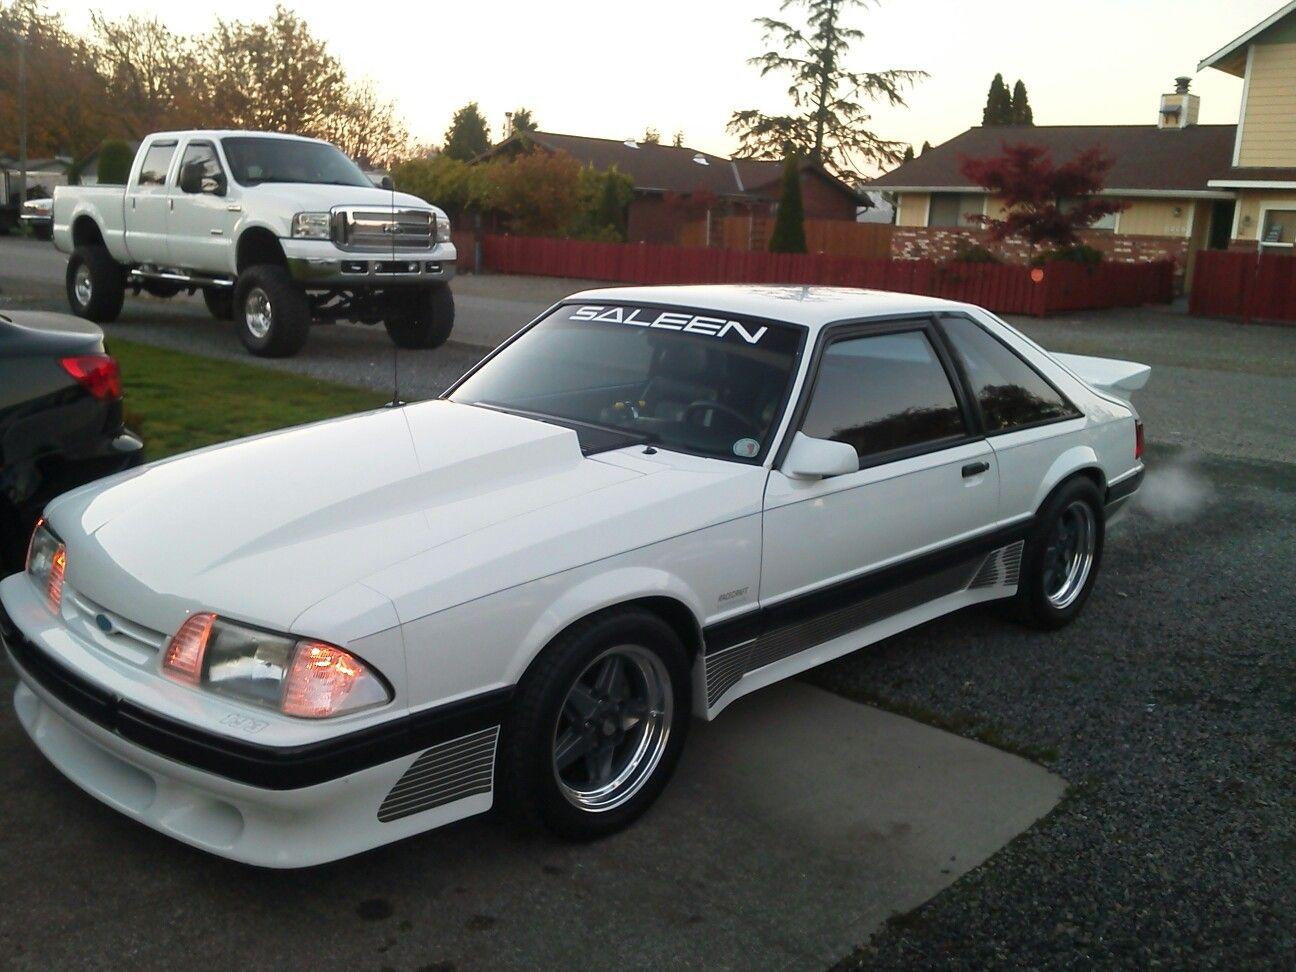 1989 Saleen Mustang Saleen Mustang Fox Body Mustang Fox Mustang